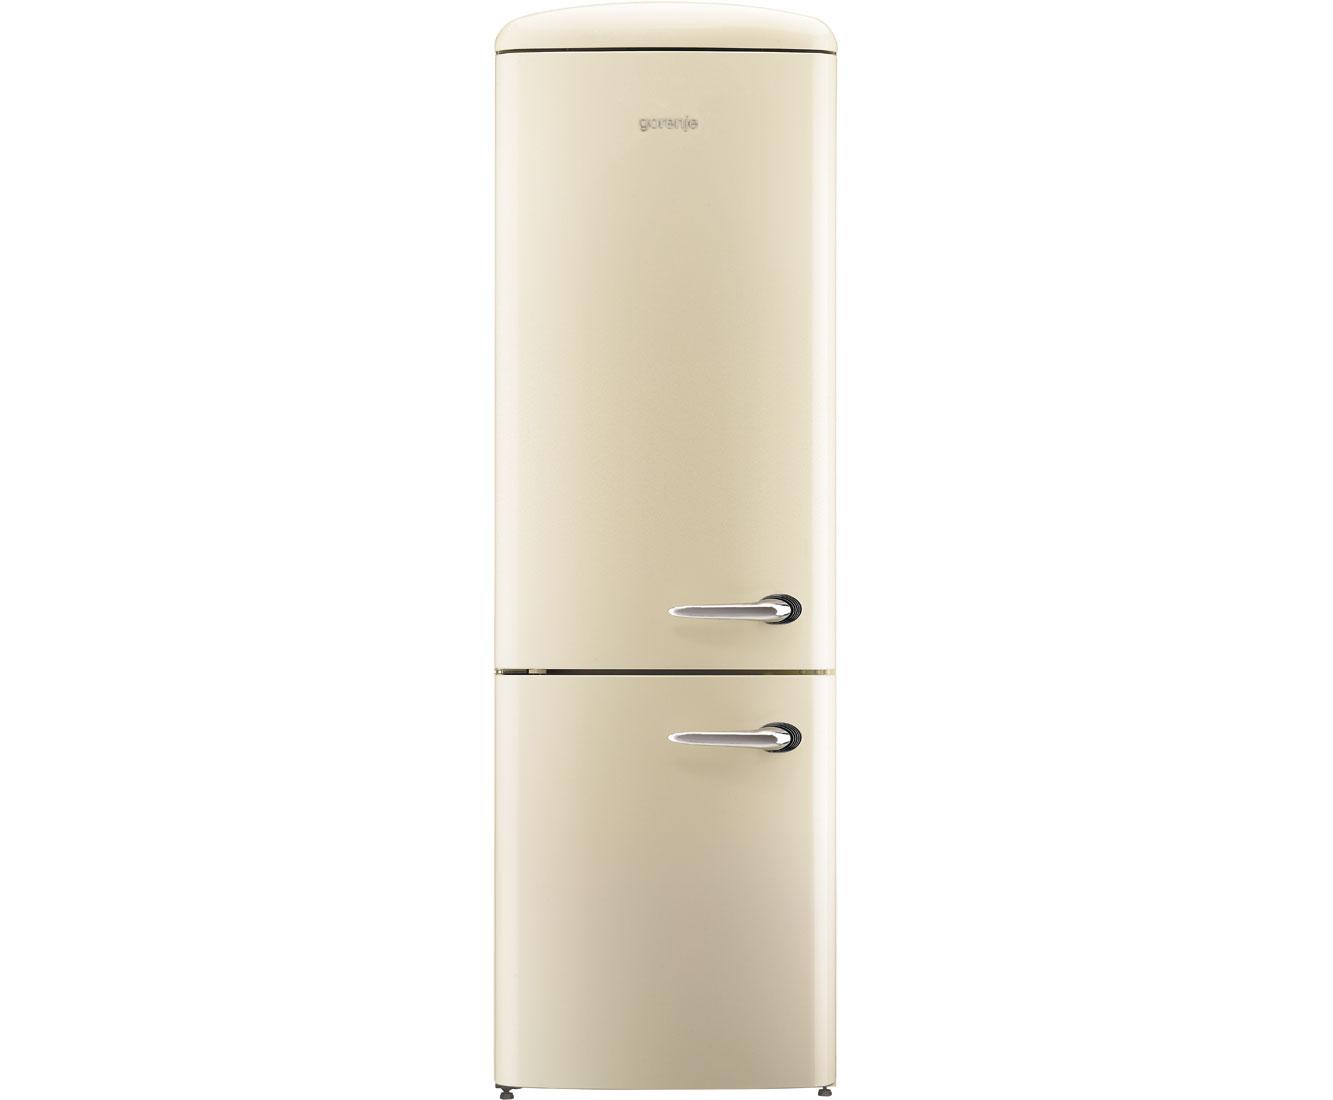 Gorenje Kühlschrank Beige : Smeg kühlschrank creme preisvergleich smeg kühlschrank retro